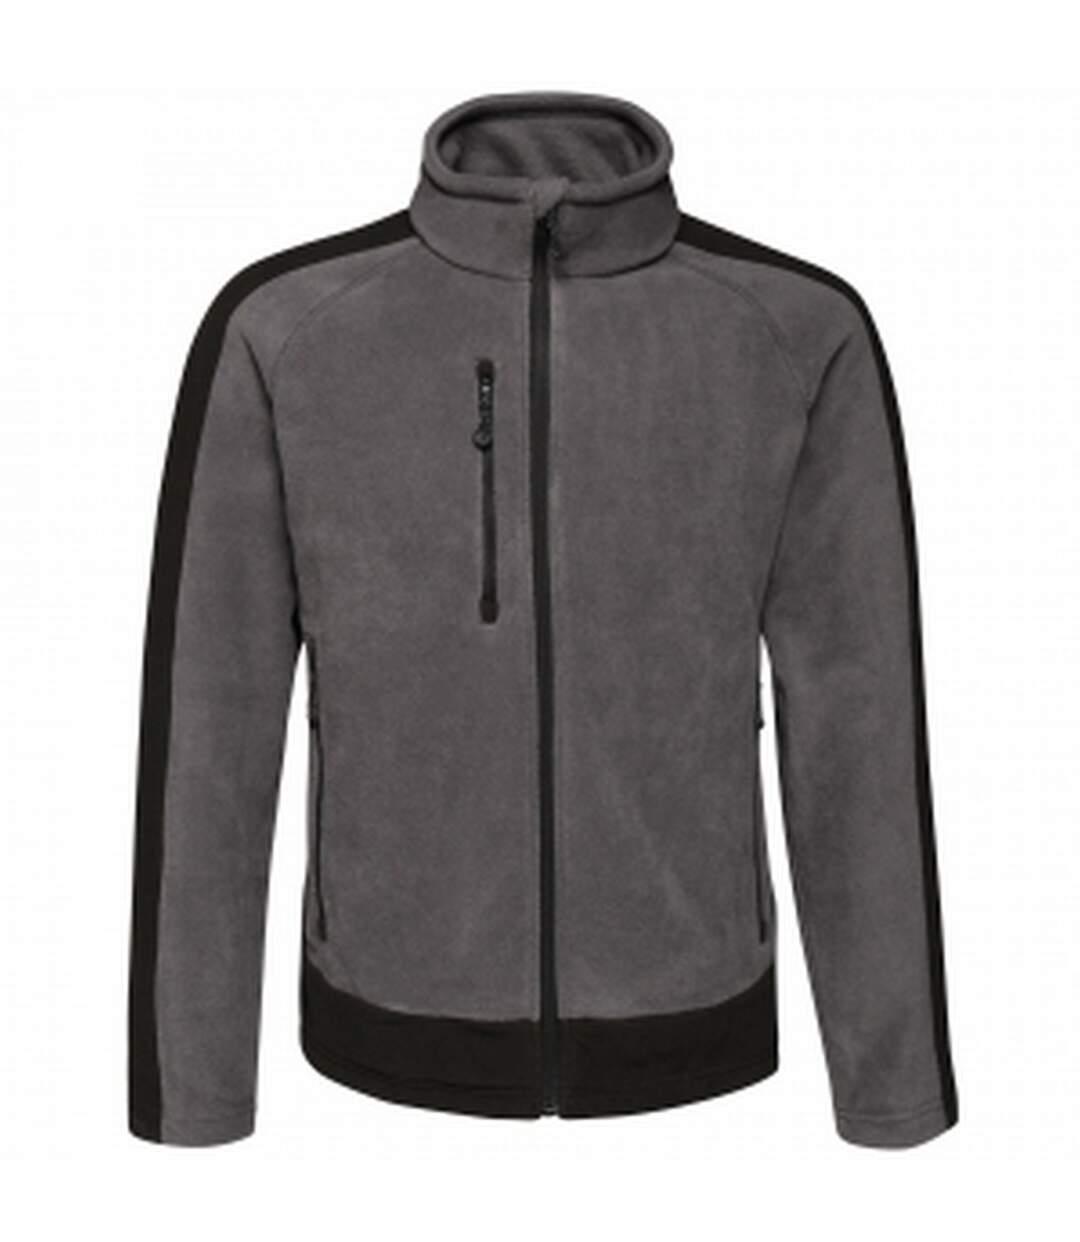 Regatta Mens Contrast Fleece Jacket (Seal Grey/Black) - UTRG3568